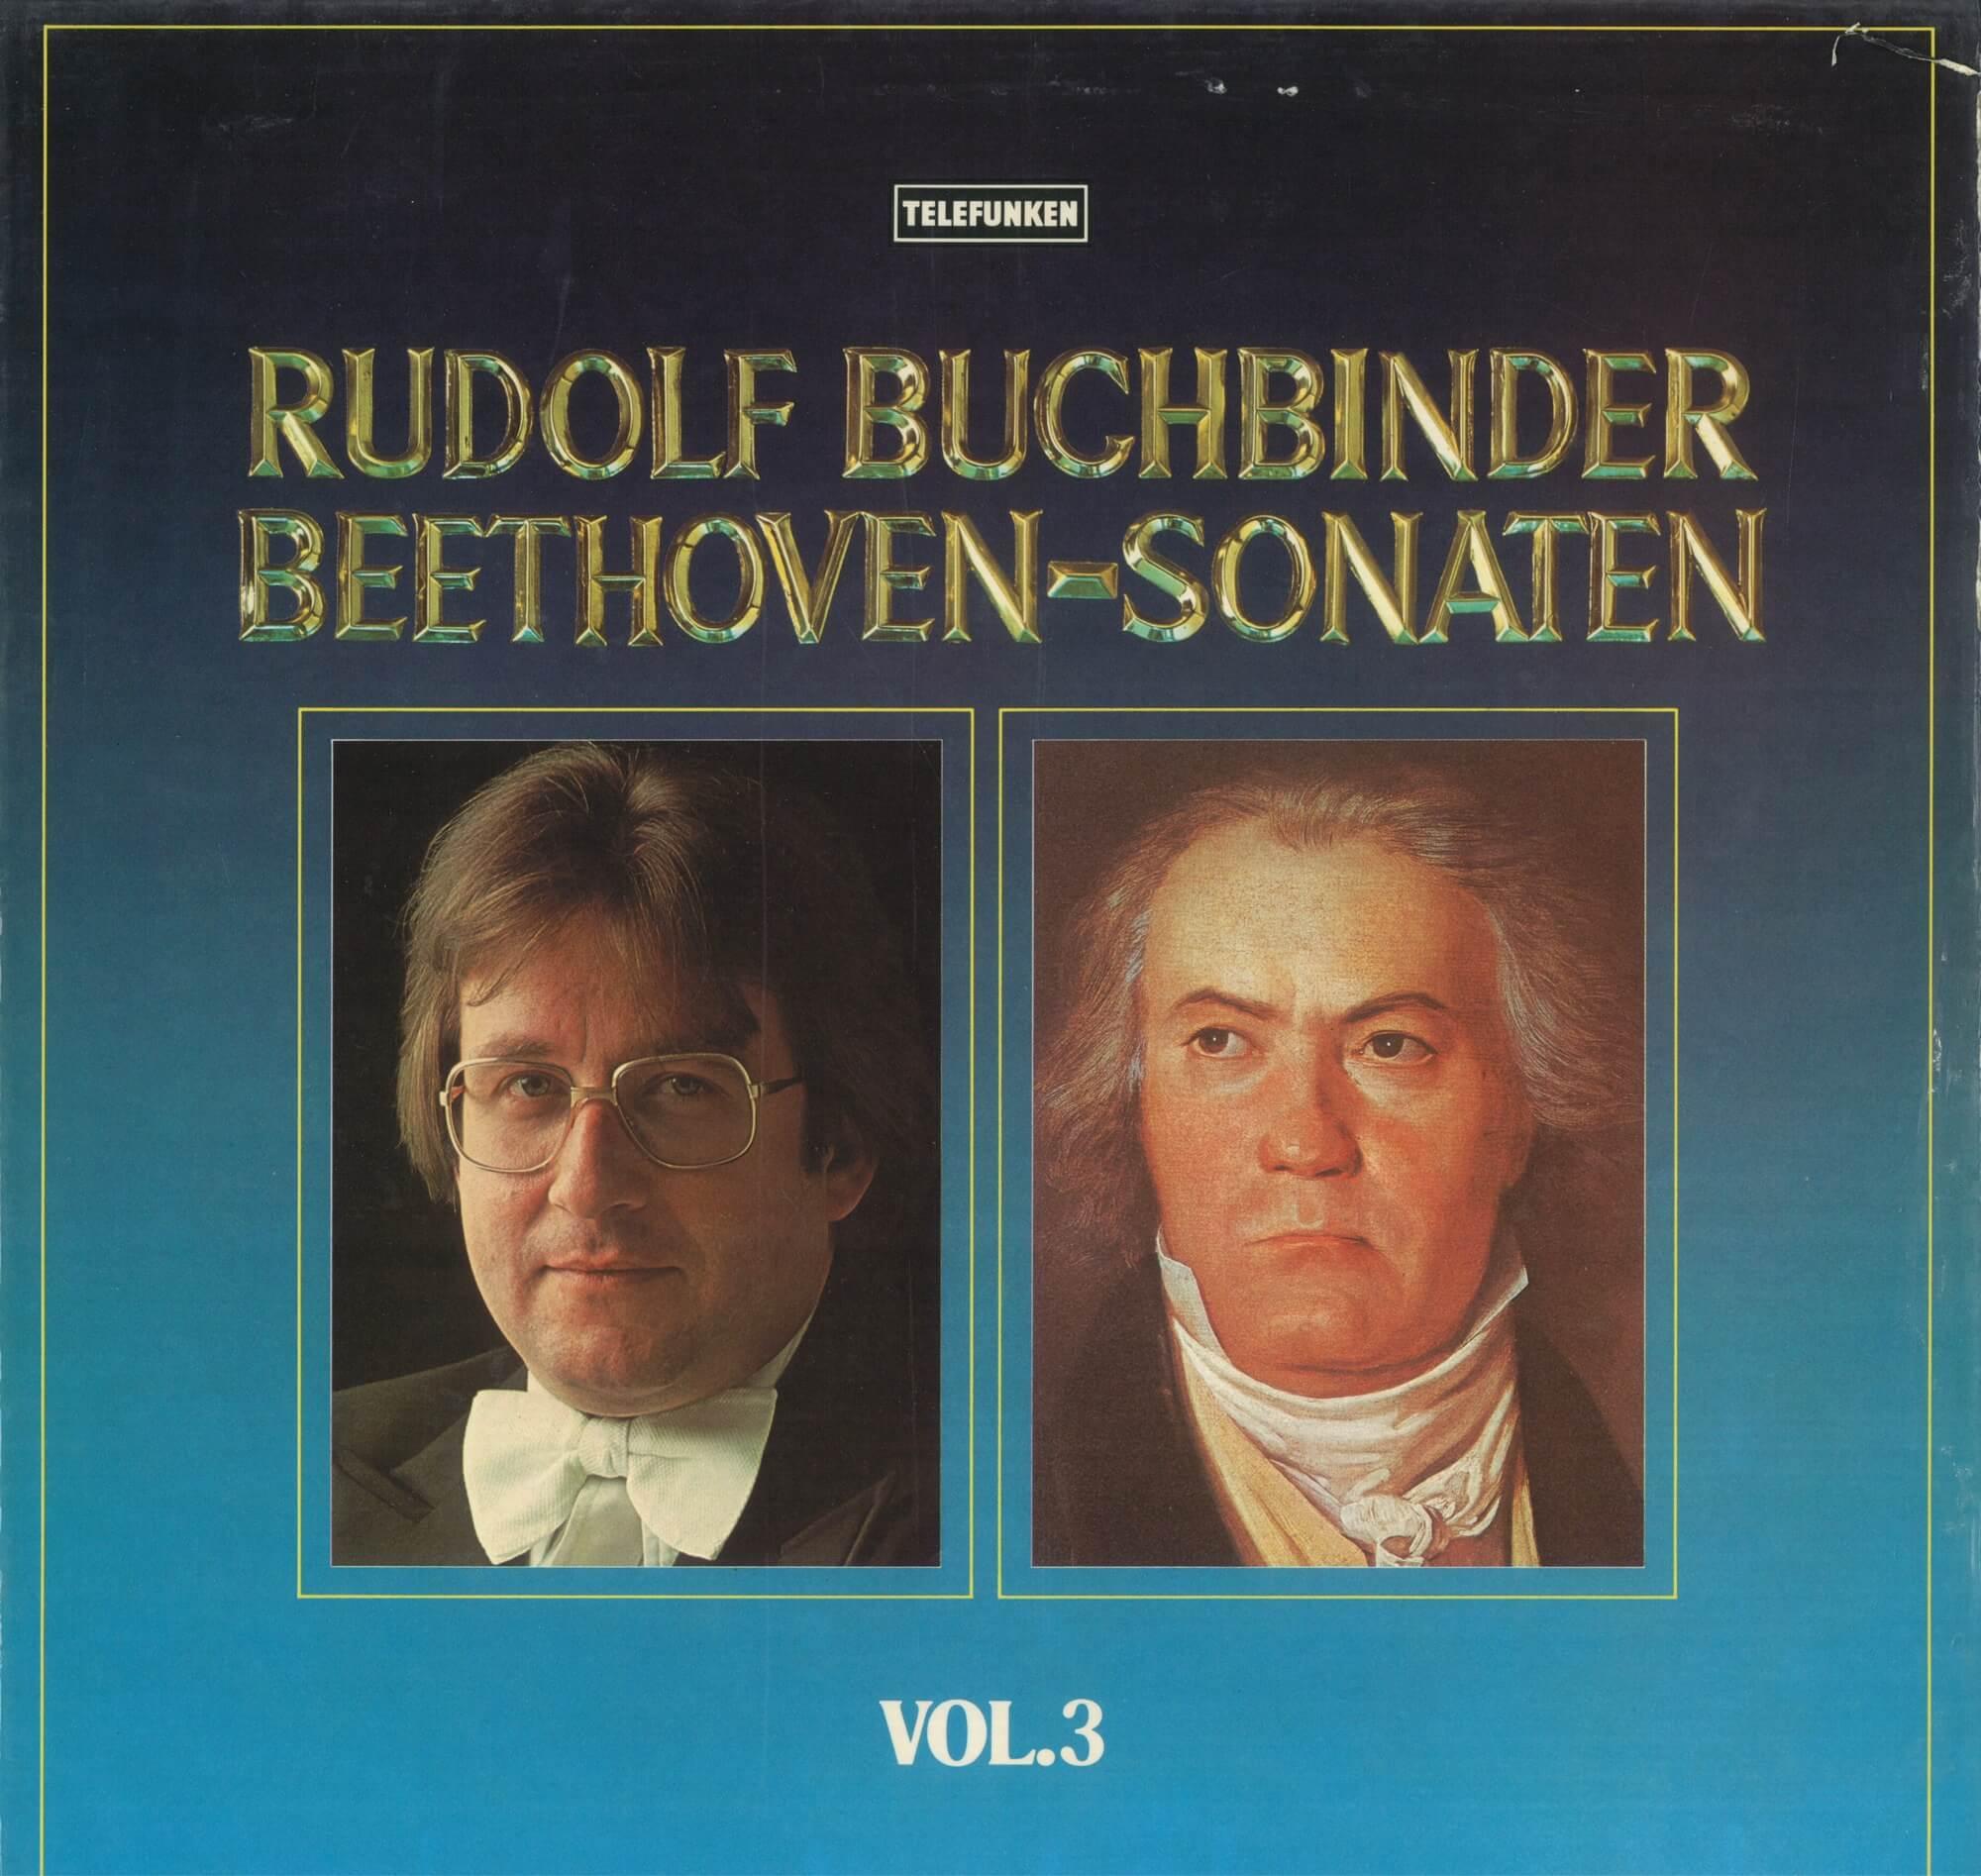 LP Cover Beethoven Sonaten Zyklus Vol 3.jpg